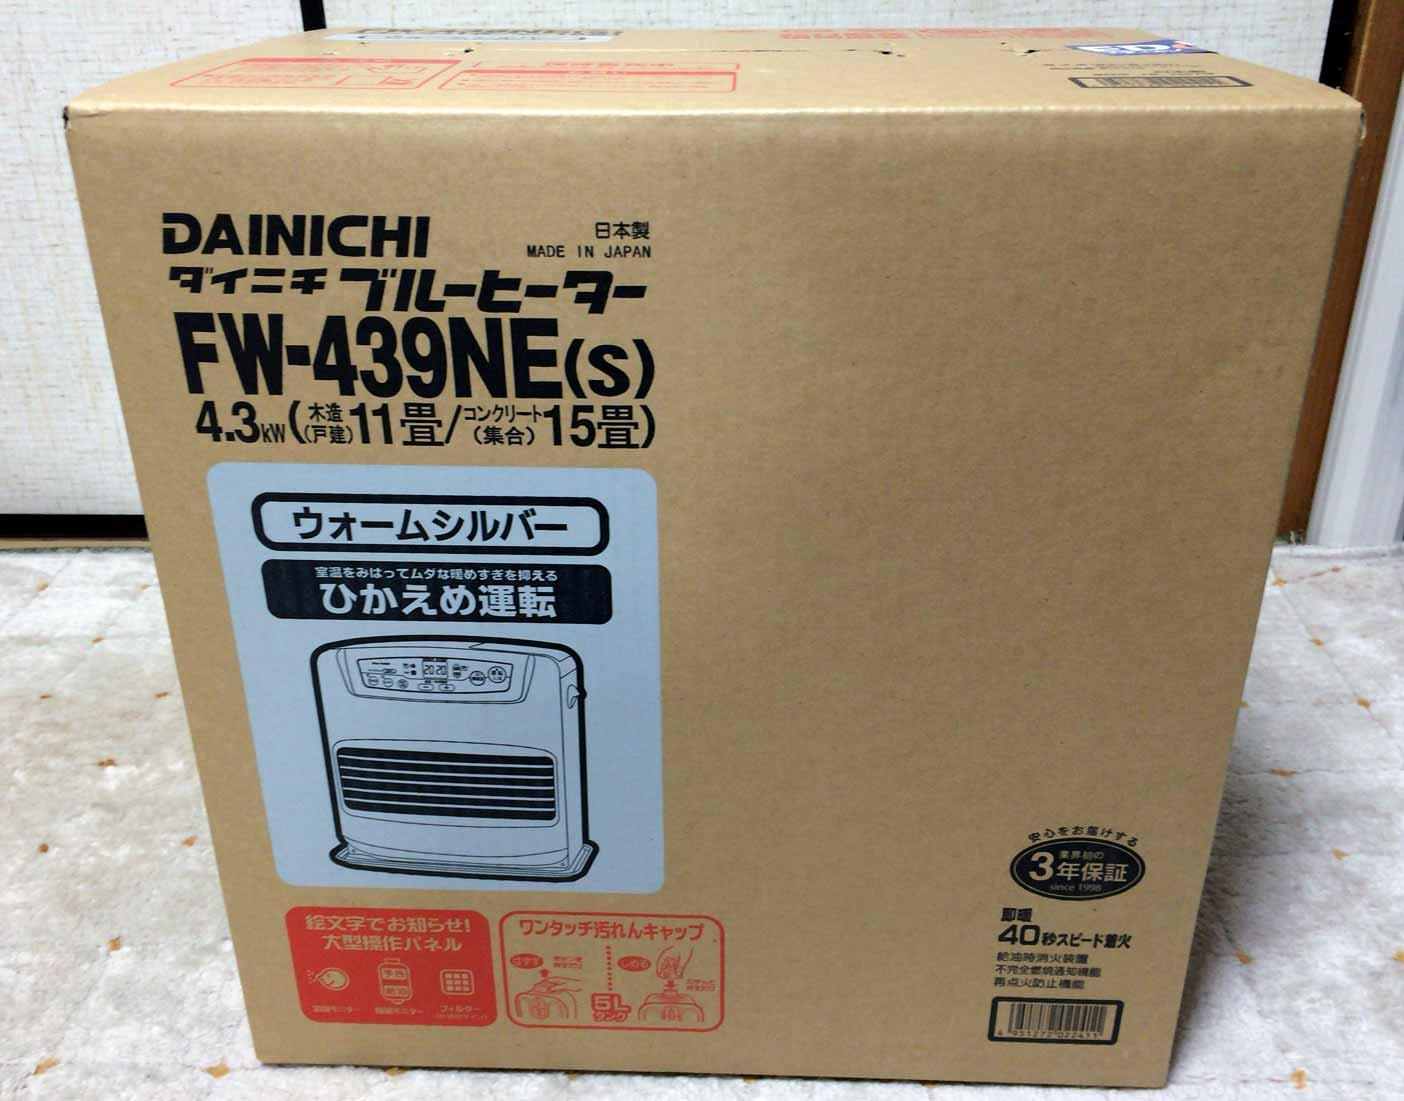 Dainichi fanheater002